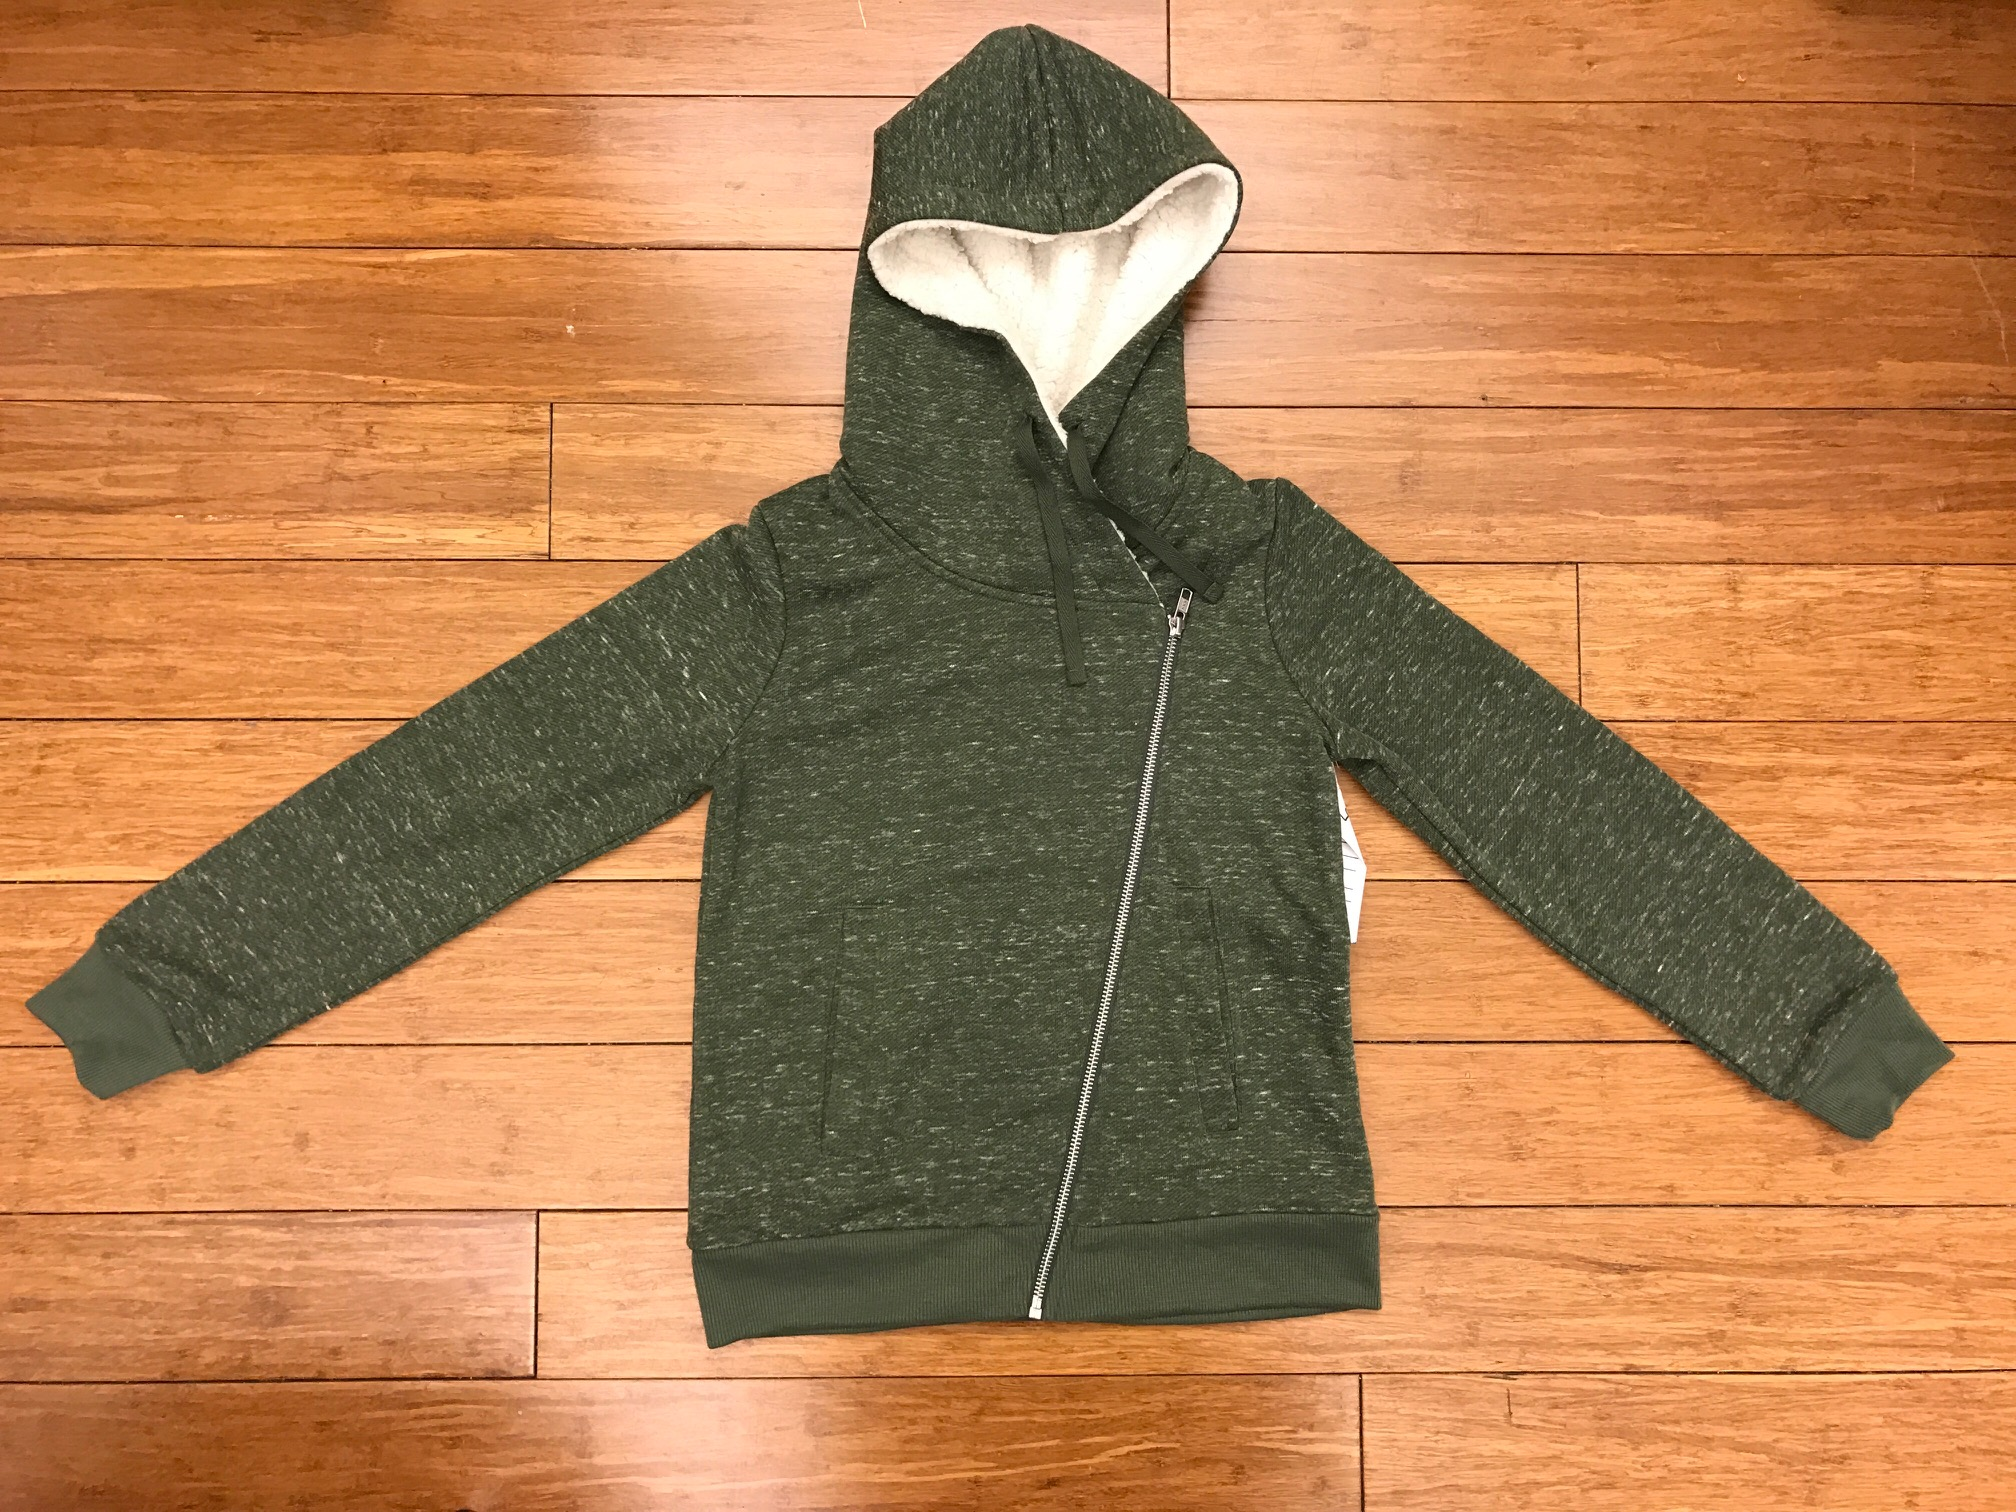 Recalled RDG Global Hooded Sweatshirt